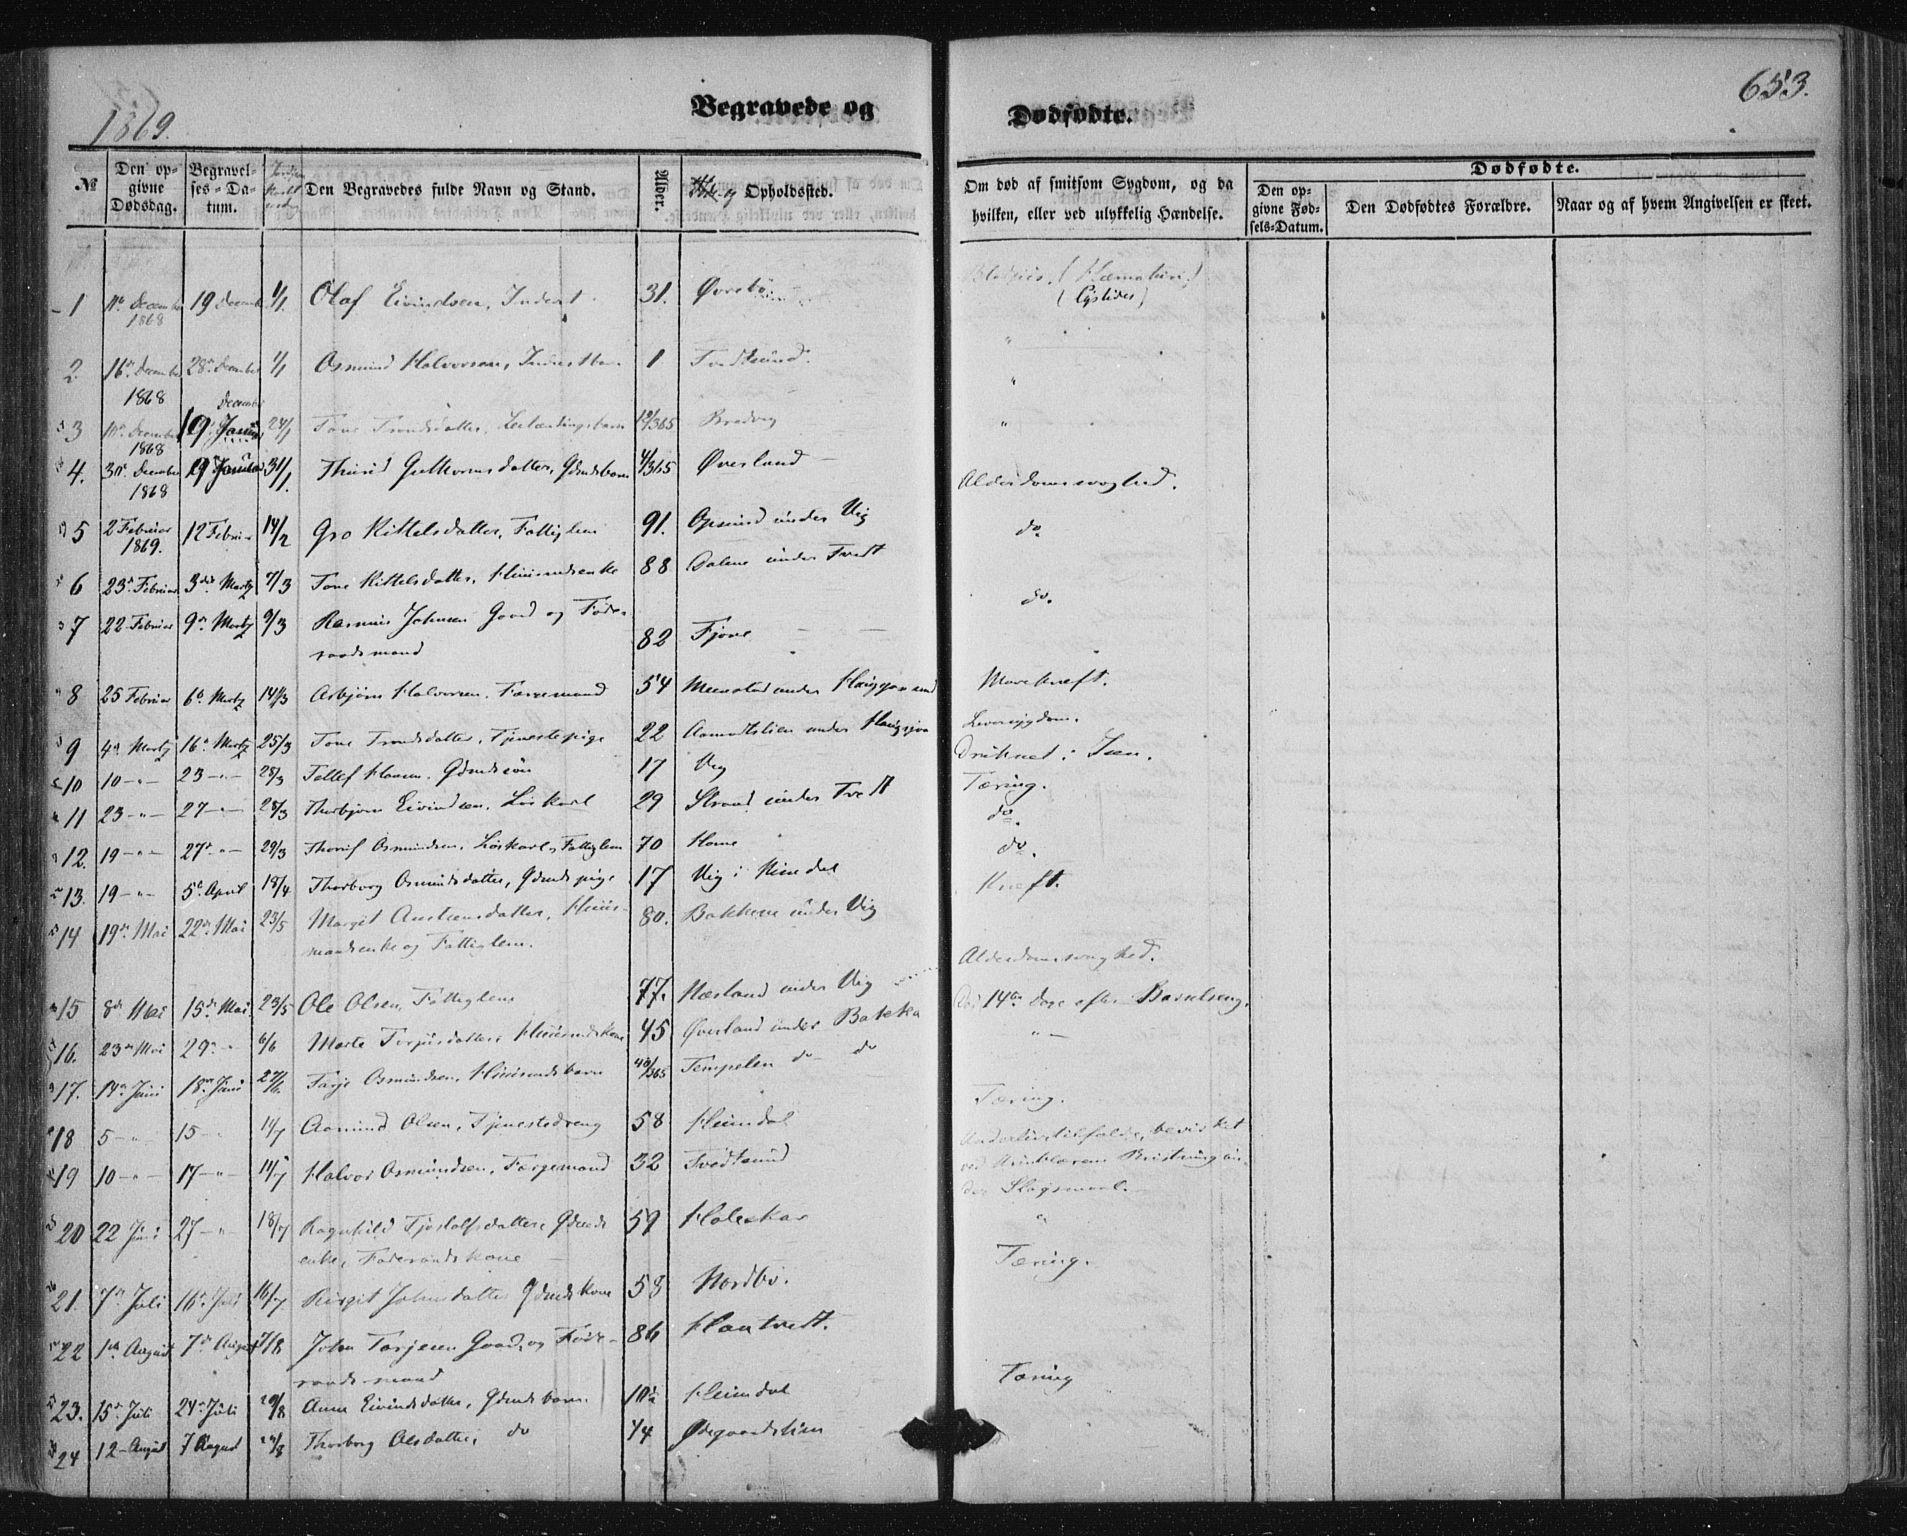 SAKO, Nissedal kirkebøker, F/Fa/L0003: Ministerialbok nr. I 3, 1846-1870, s. 652-653